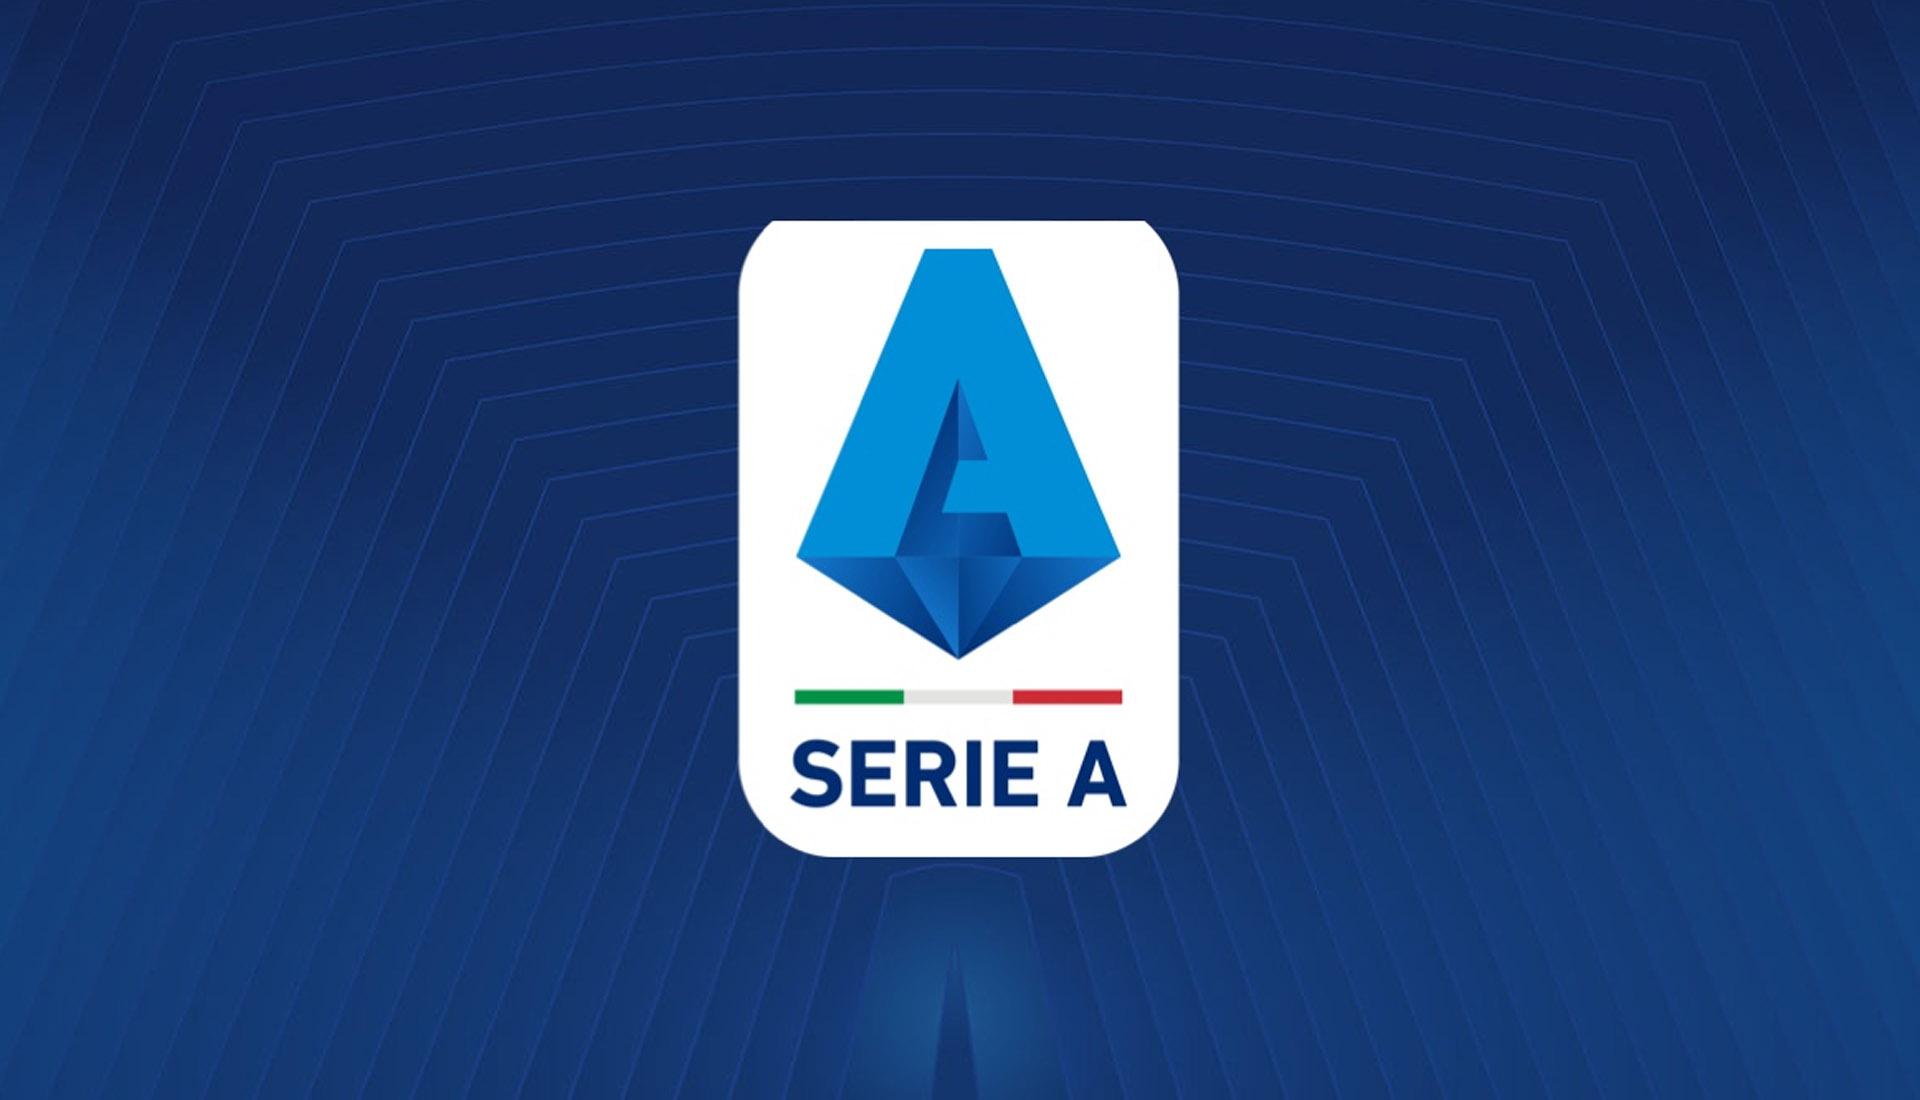 1-serie-a-logo-new